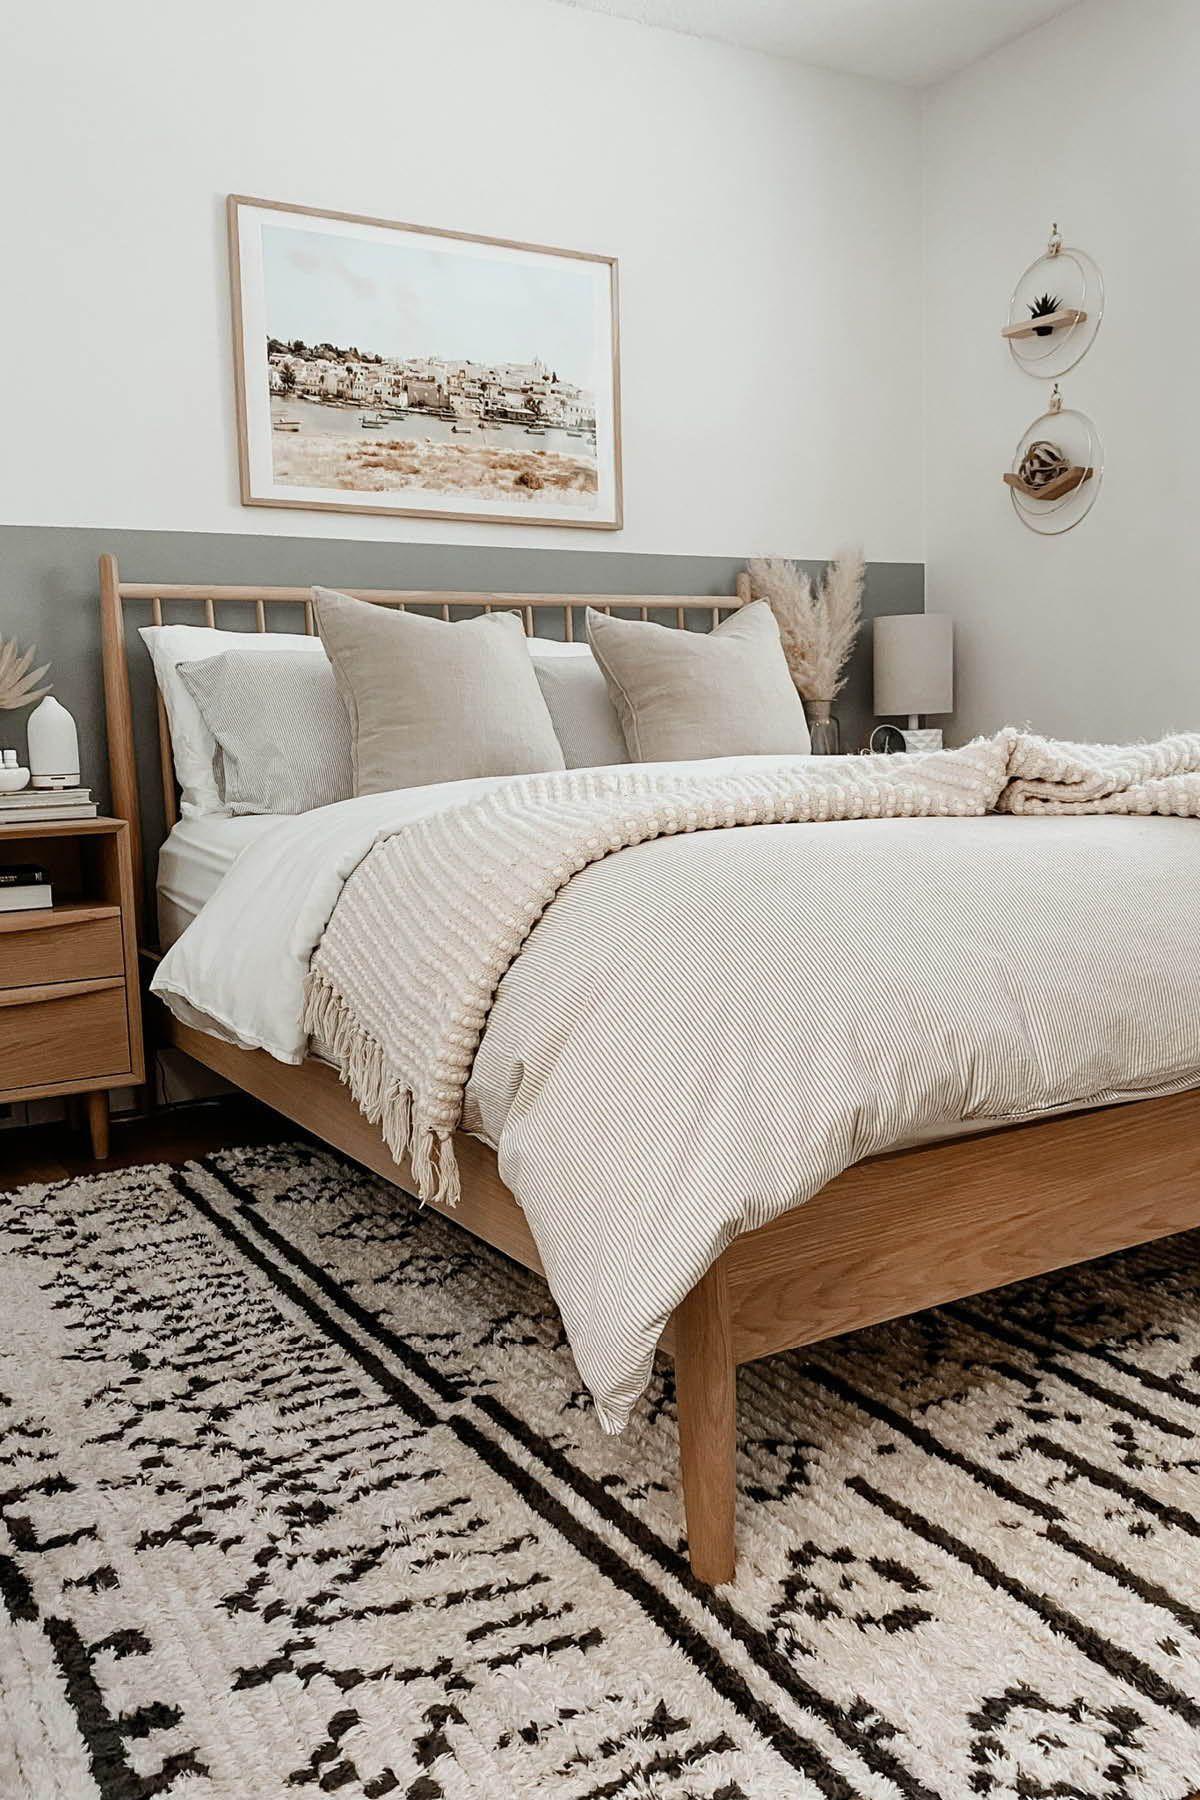 Lenia White Oak Queen Bed In 2021 Cozy Master Bedroom Wall Panels Bedroom Adjustable Bed Frame Bedroom ideas white oak